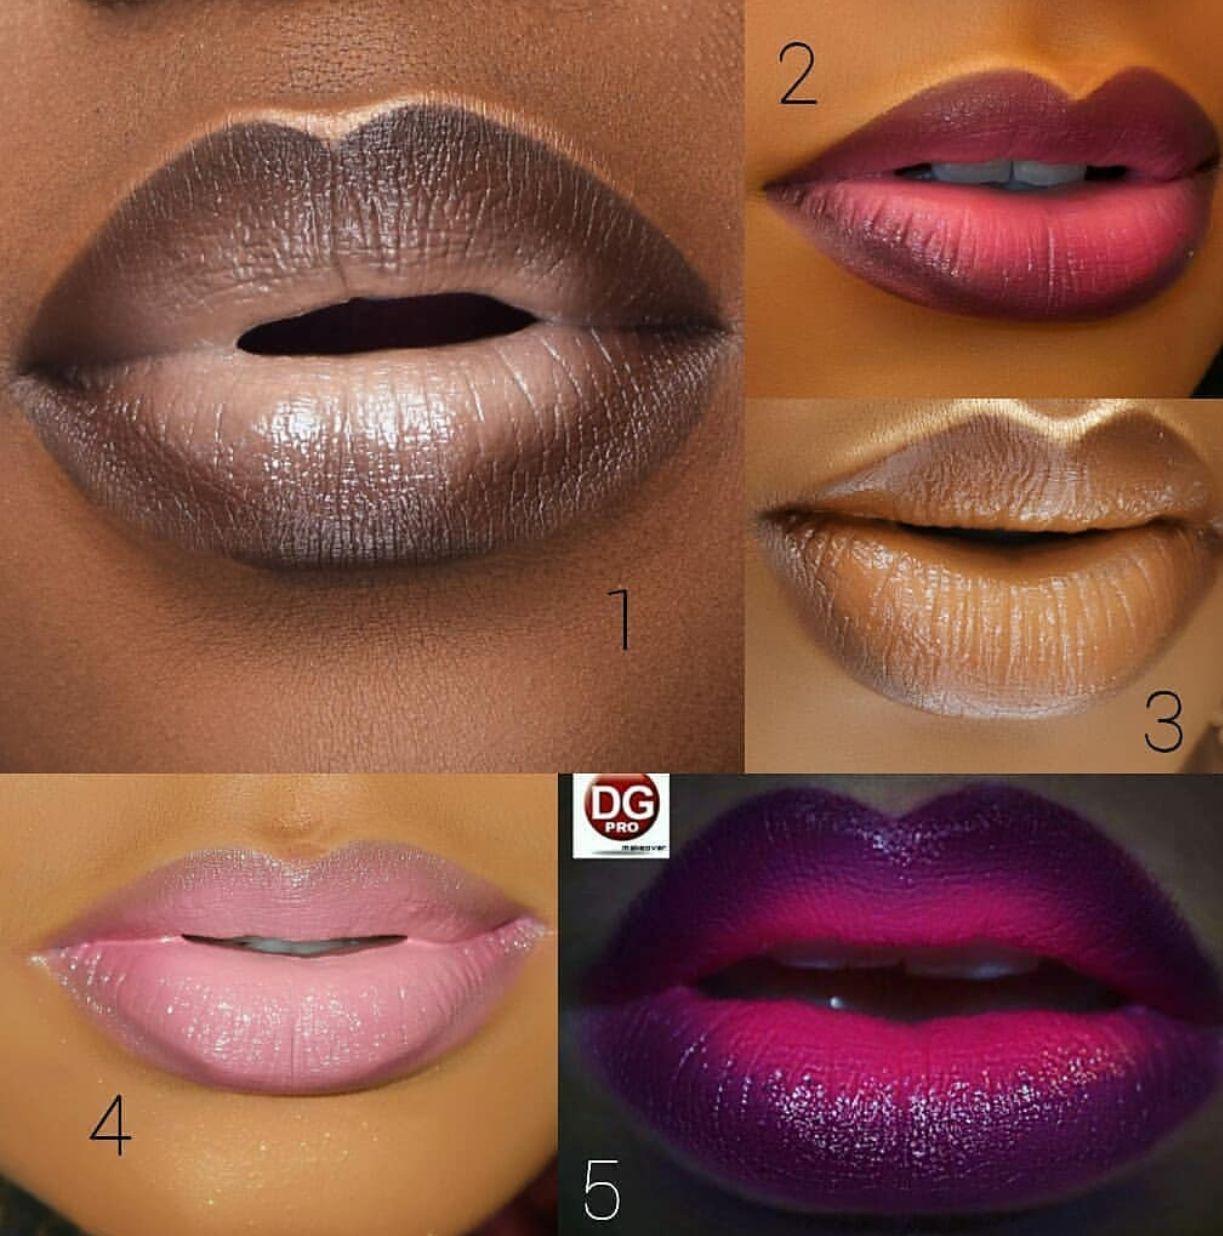 Makeup For Black Women Skin Makeup Makeup For Black Women Dark